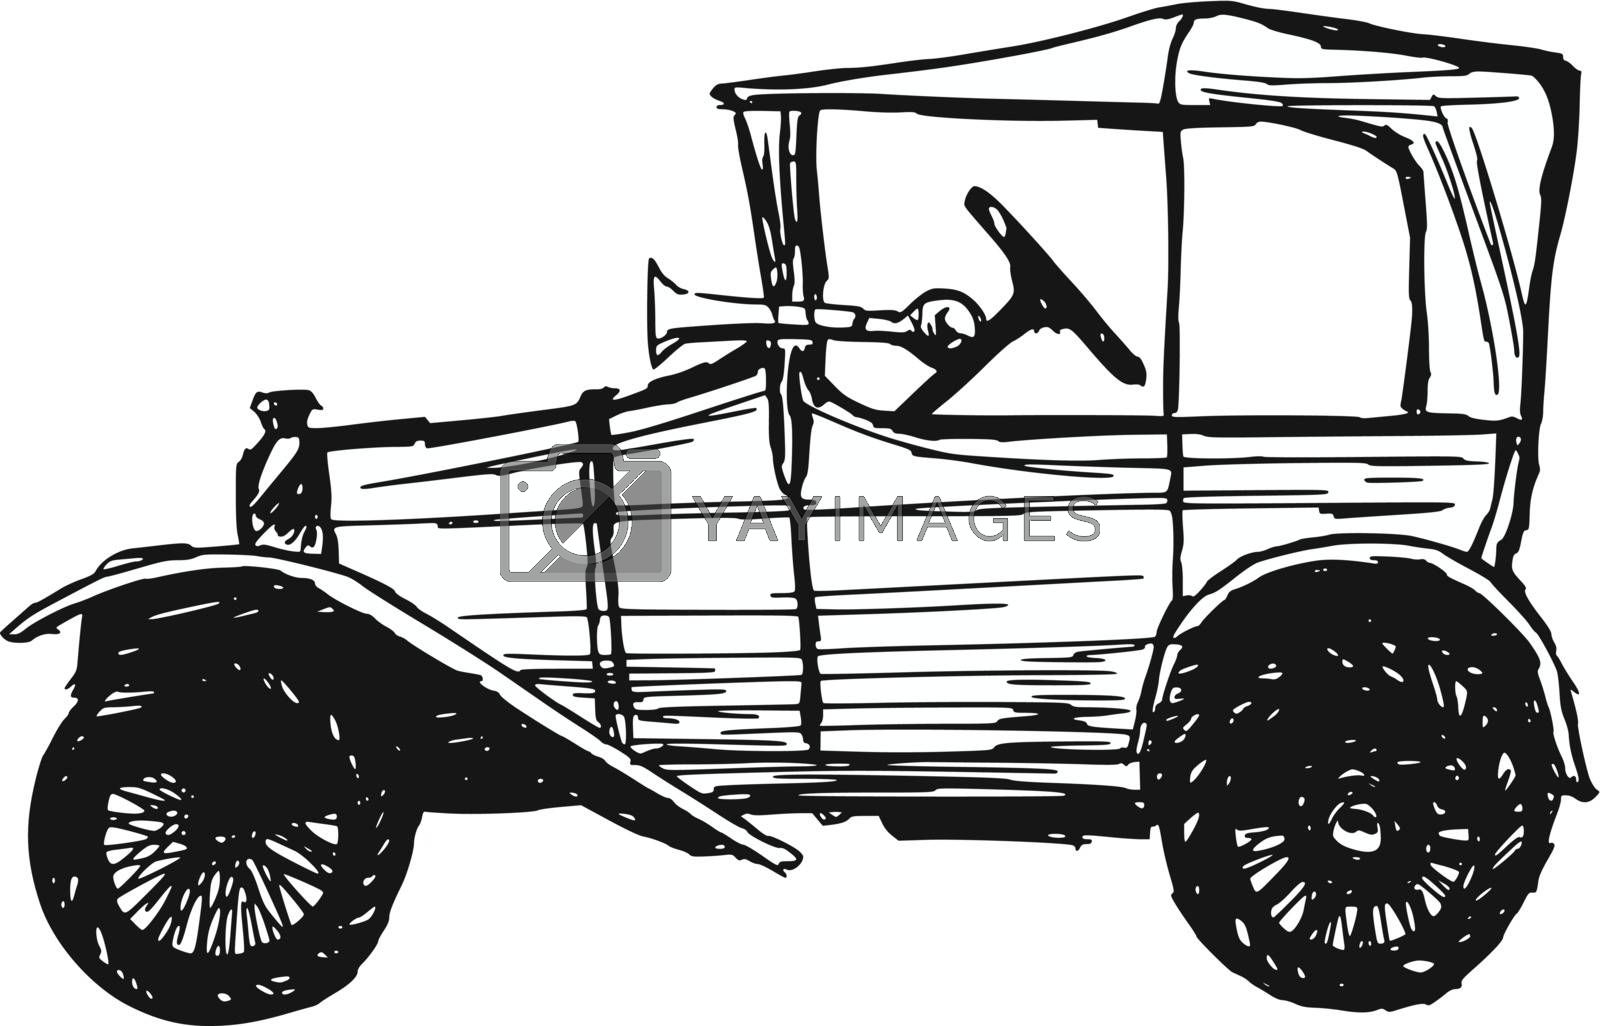 hand drawn, sketch, cartoon illustration of retro car